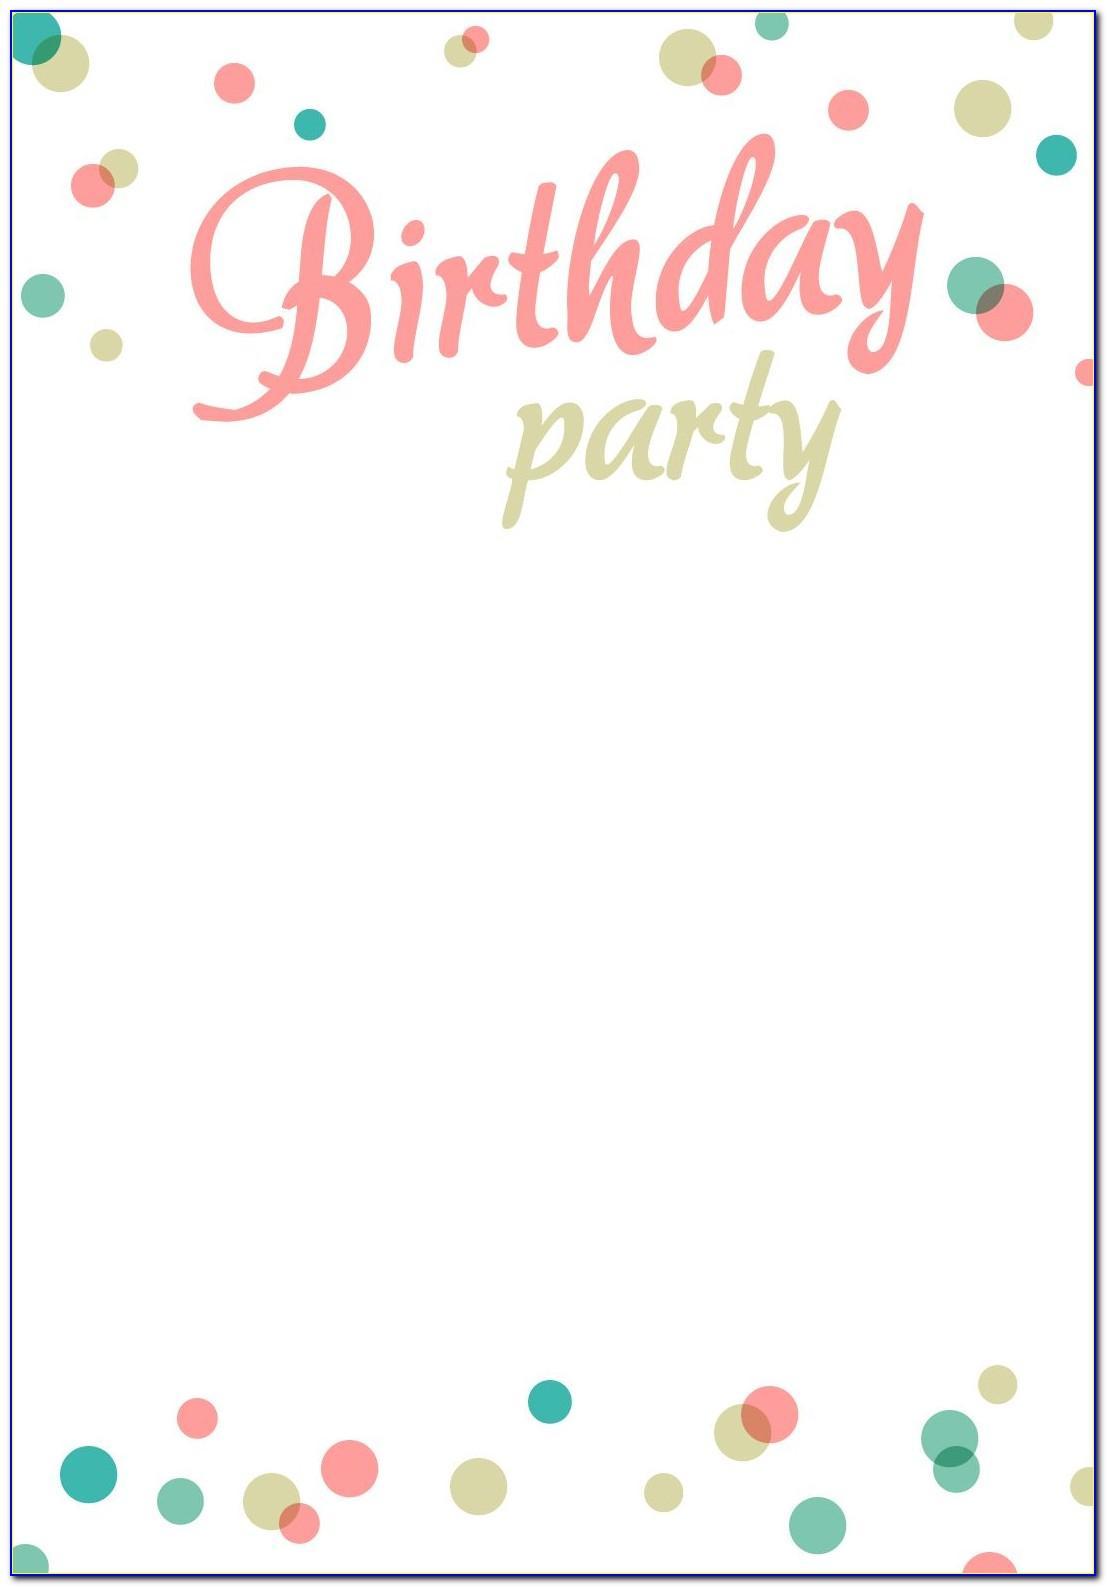 Free Printable Birthday Invitation Cards With Photo